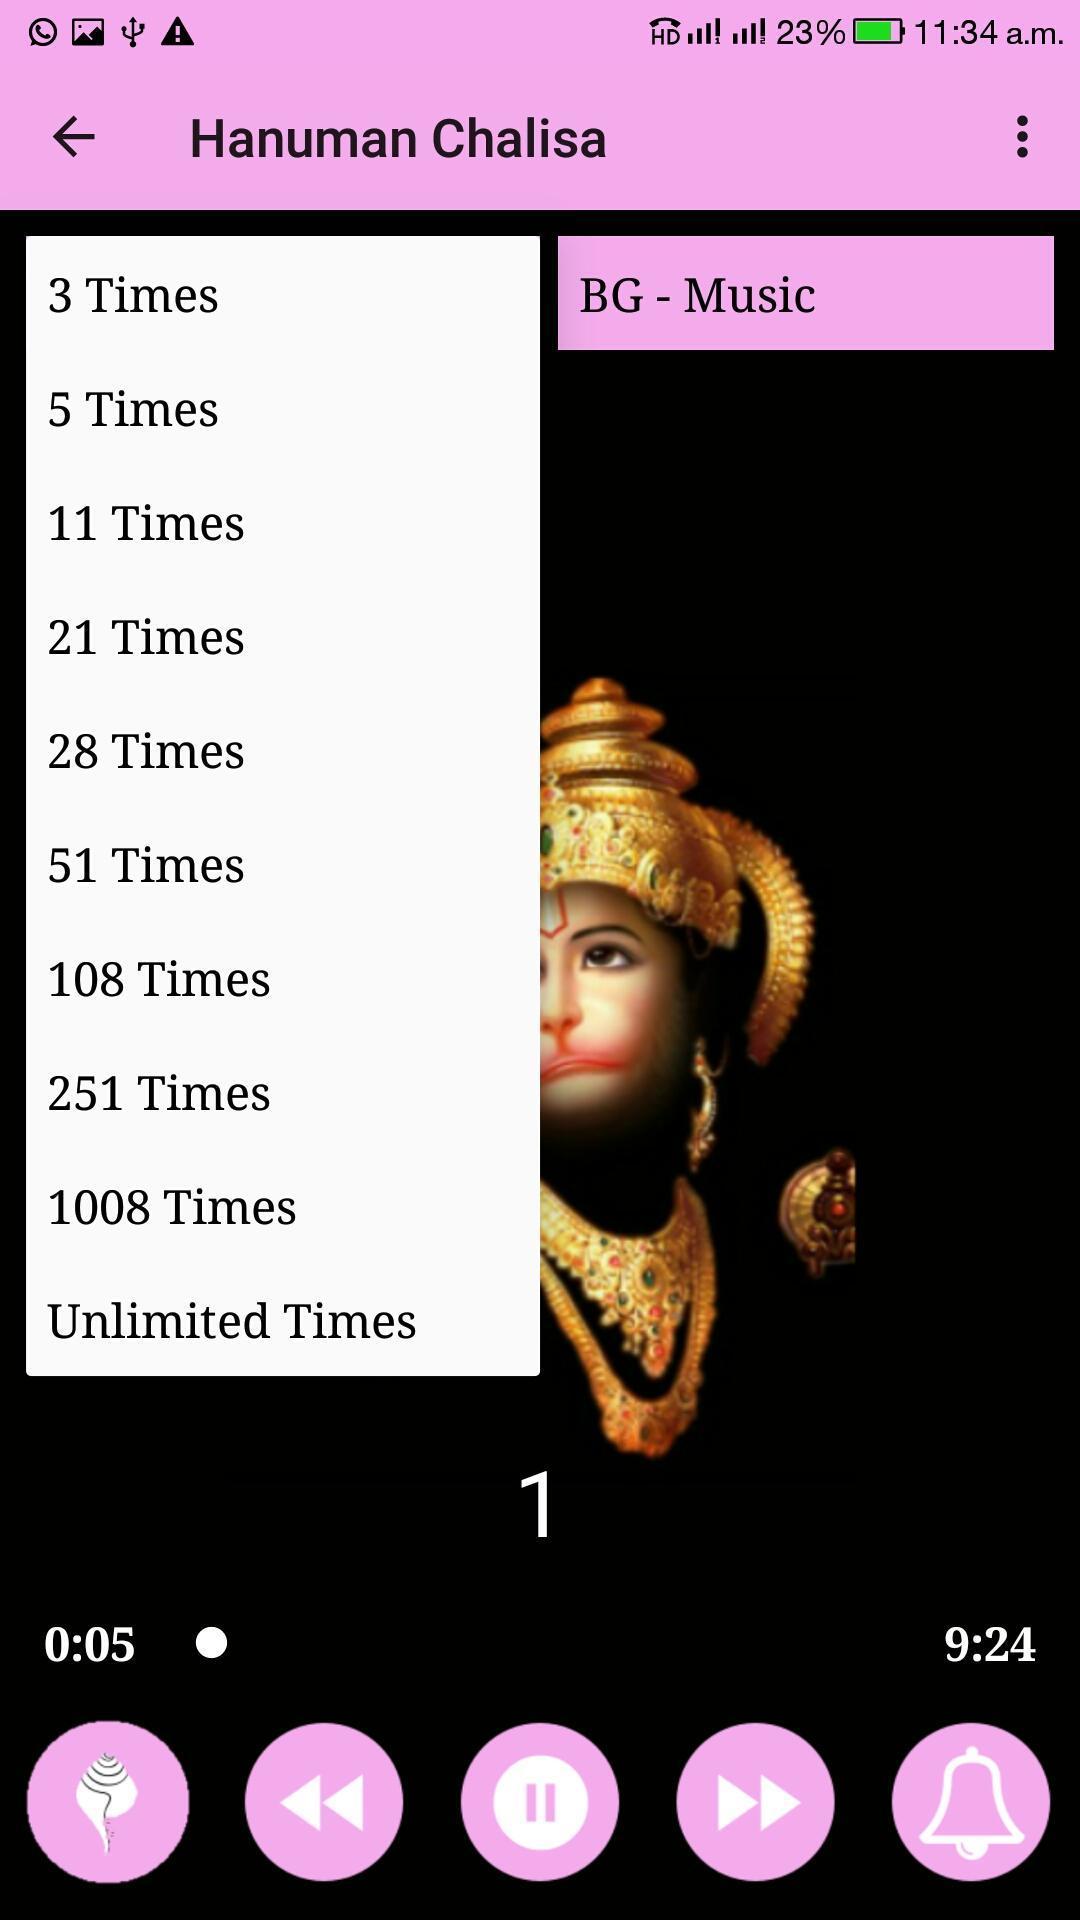 Hanuman Chalisa for Android - APK Download